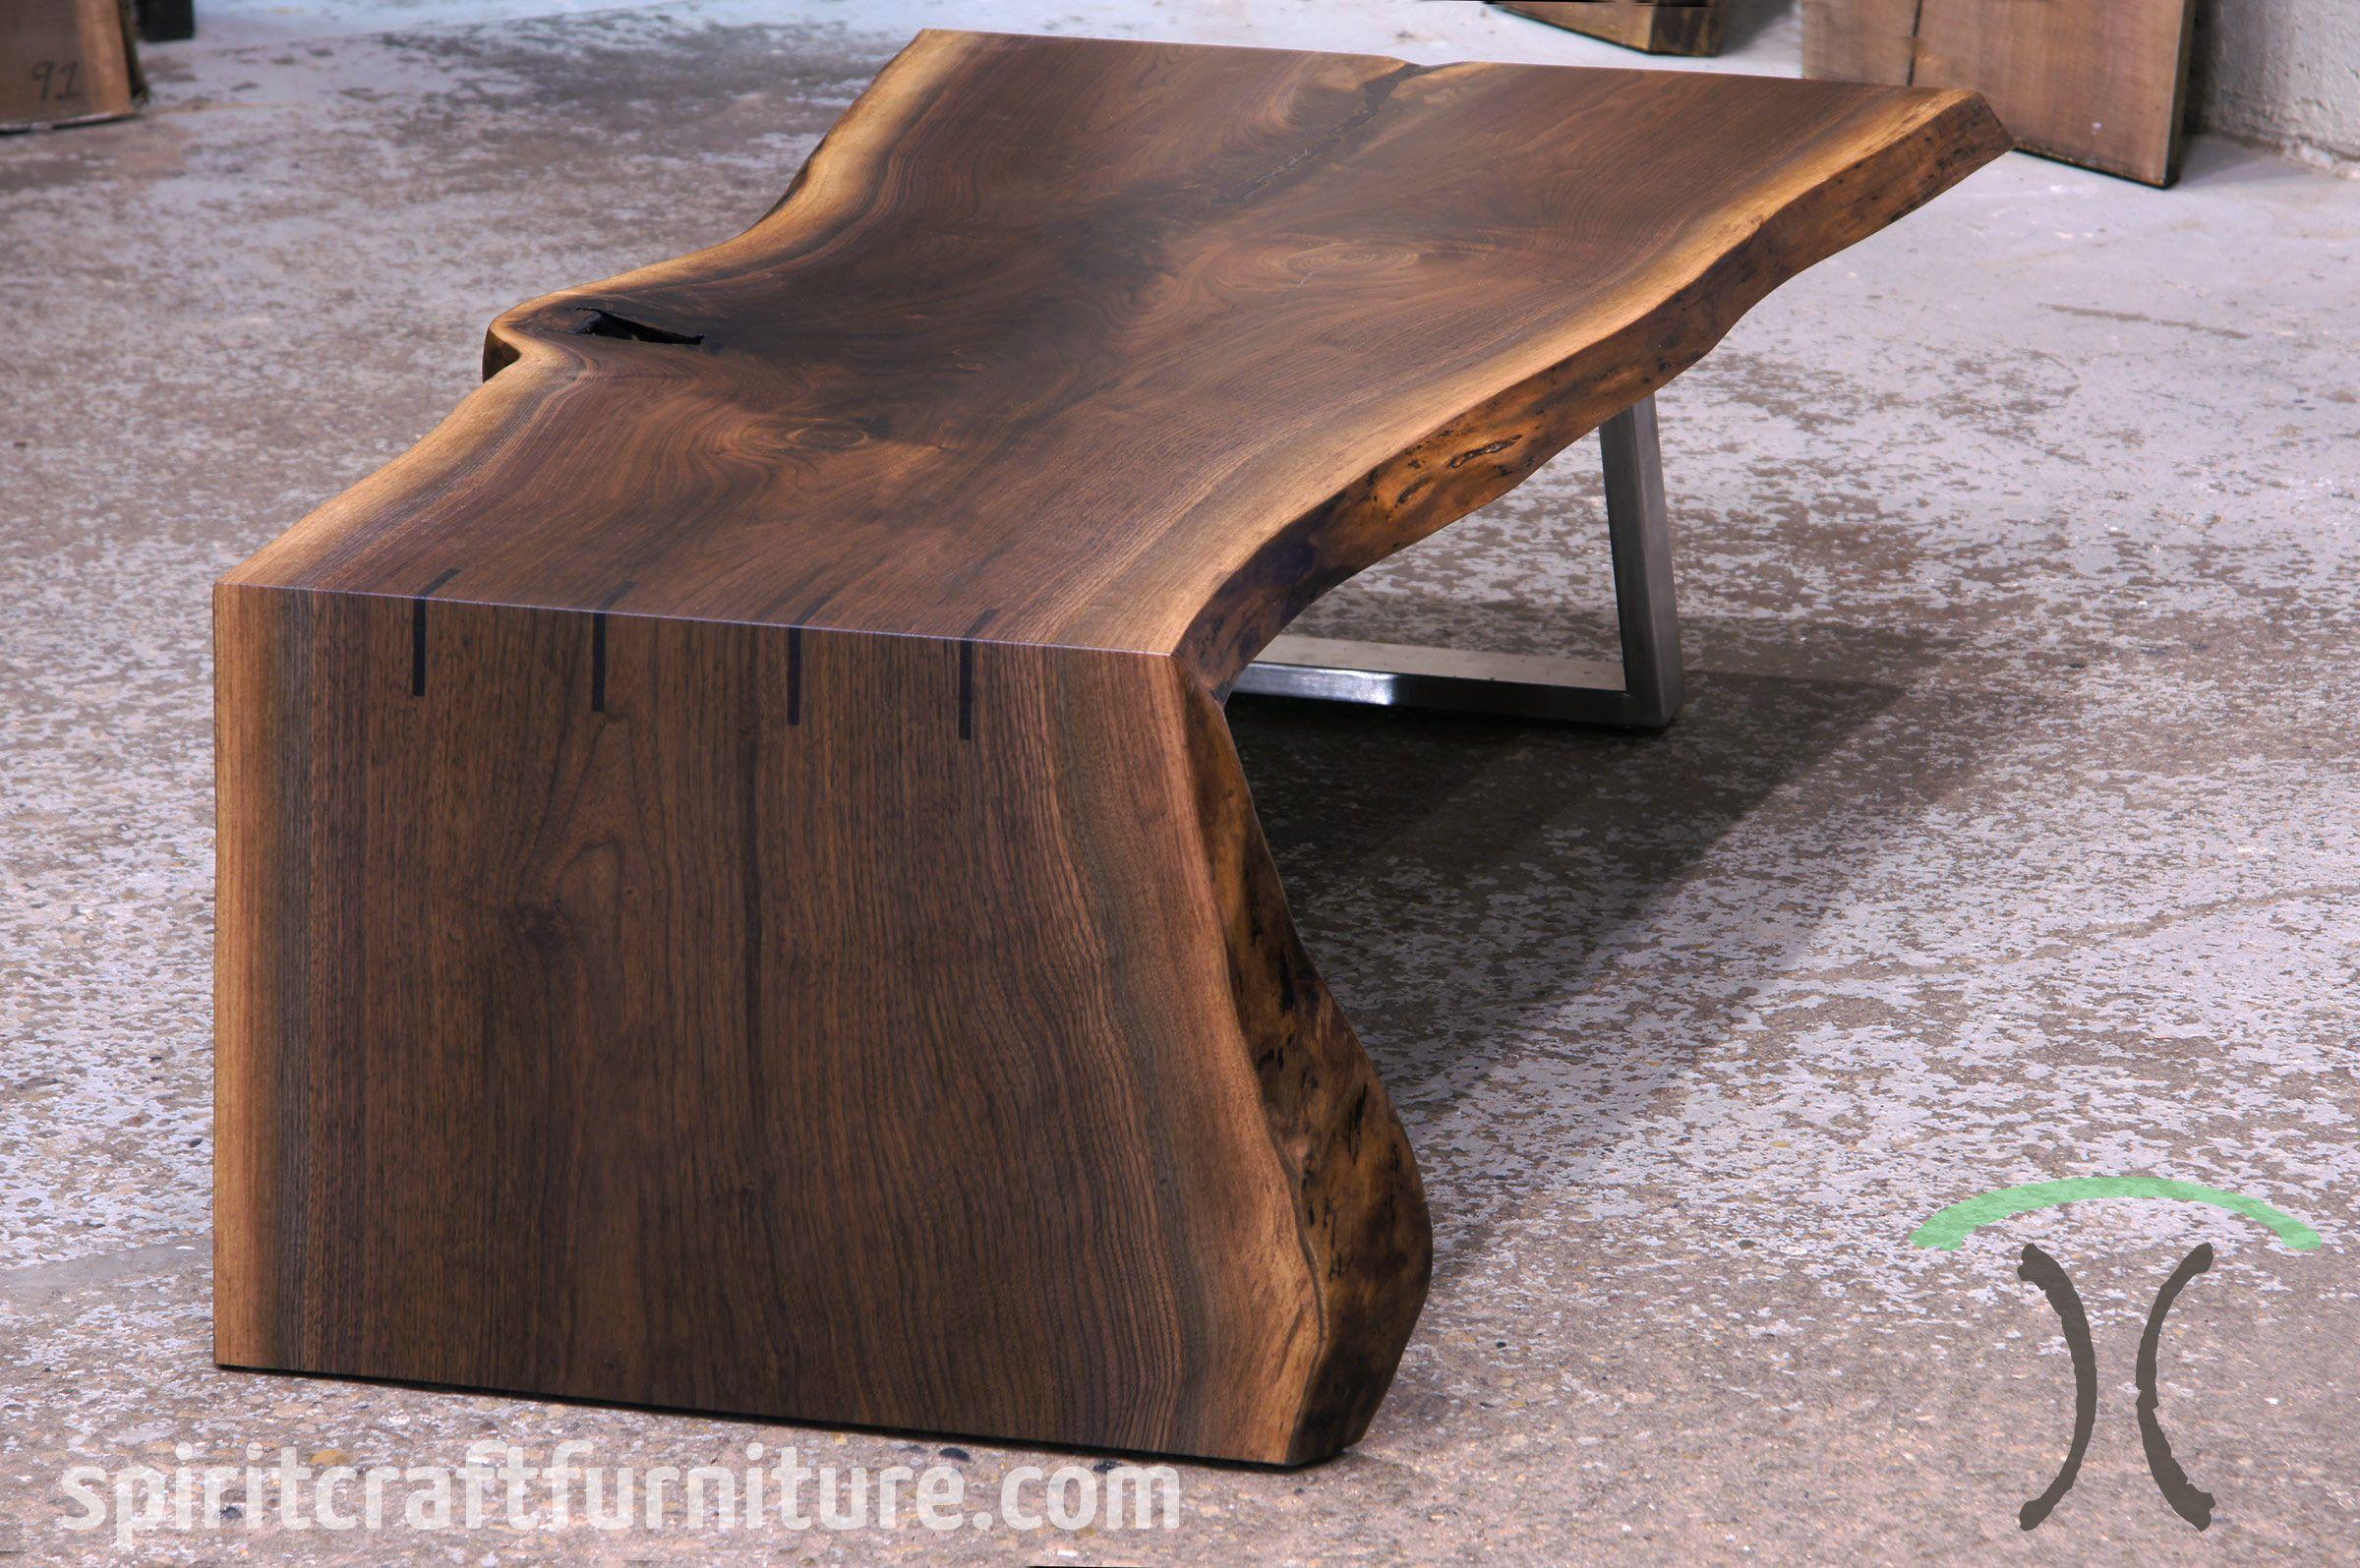 Black Walnut Waterfall Coffee Table Solid Wood Table Tops Hardwood Table Live Edge Dining Table